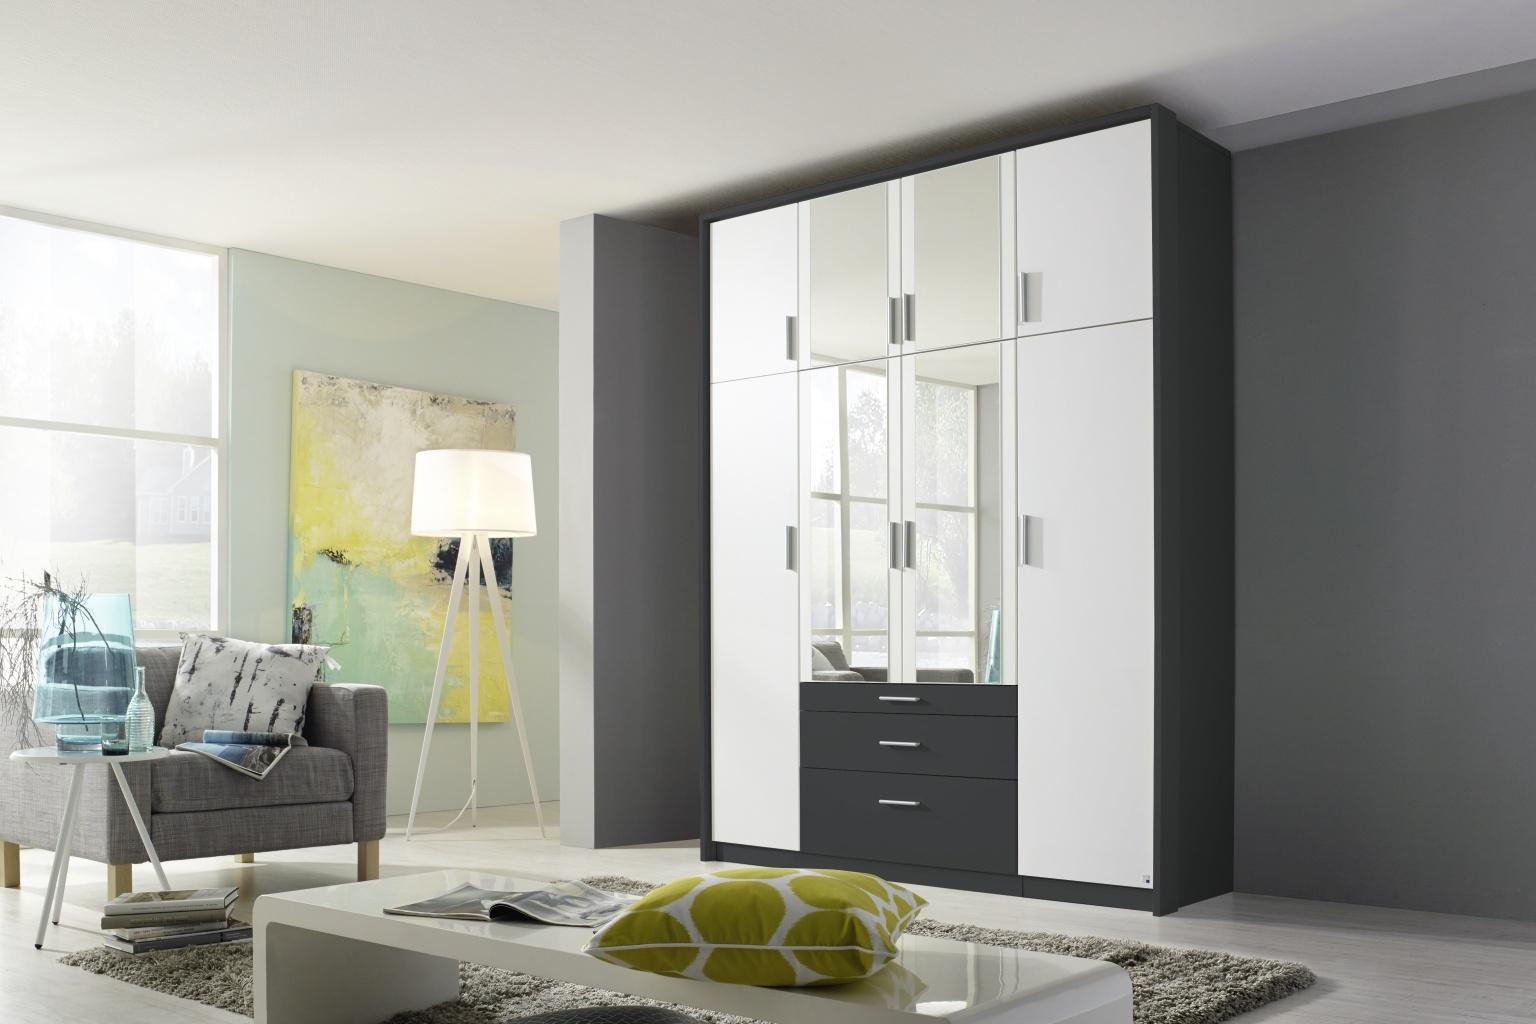 Rauch Hildesheim Extra 8 Door Combi Wardrobe in Metallic Grey and White - W 186cm